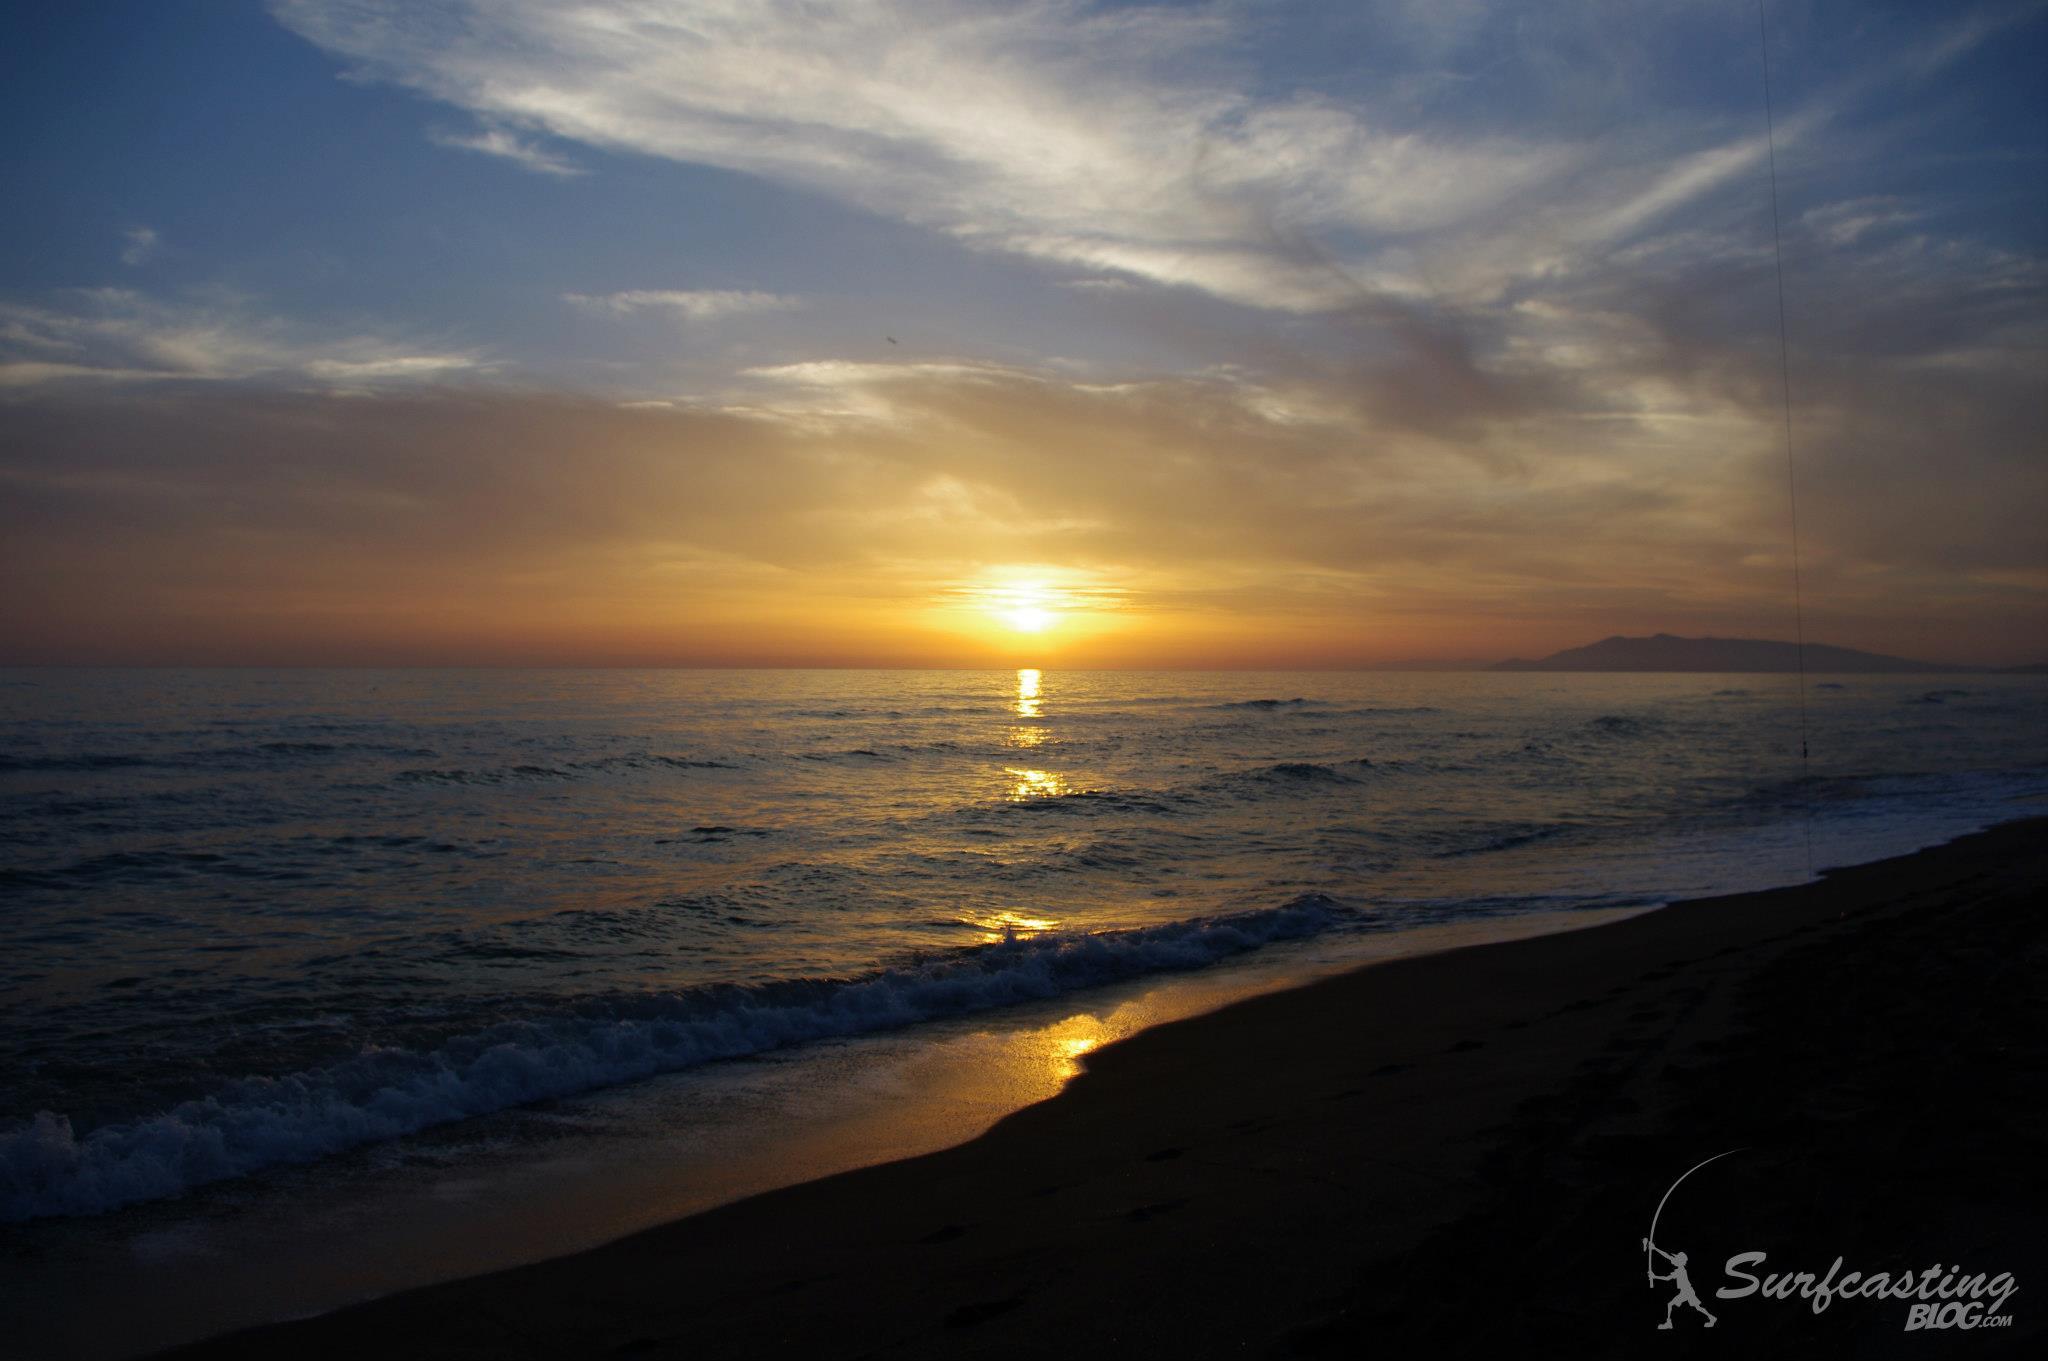 tramonto surfcasting blog